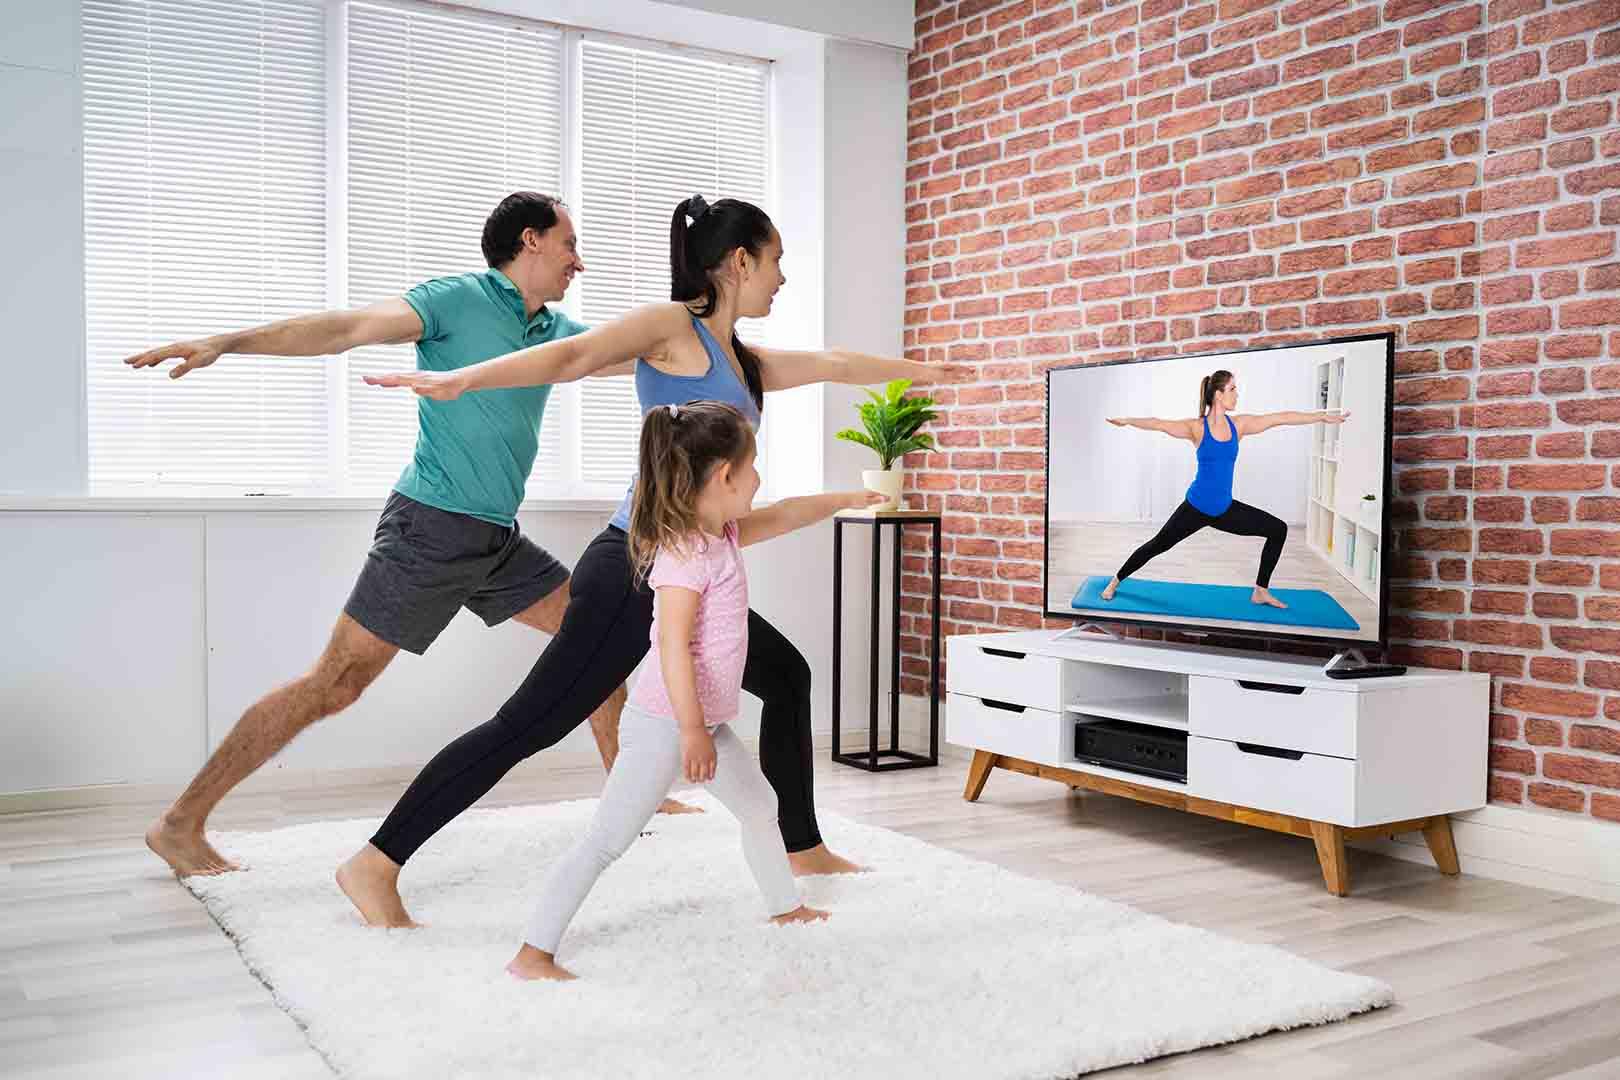 4 Jenis Olahraga untuk Membantu Mengurangi Stres - Jovee.id